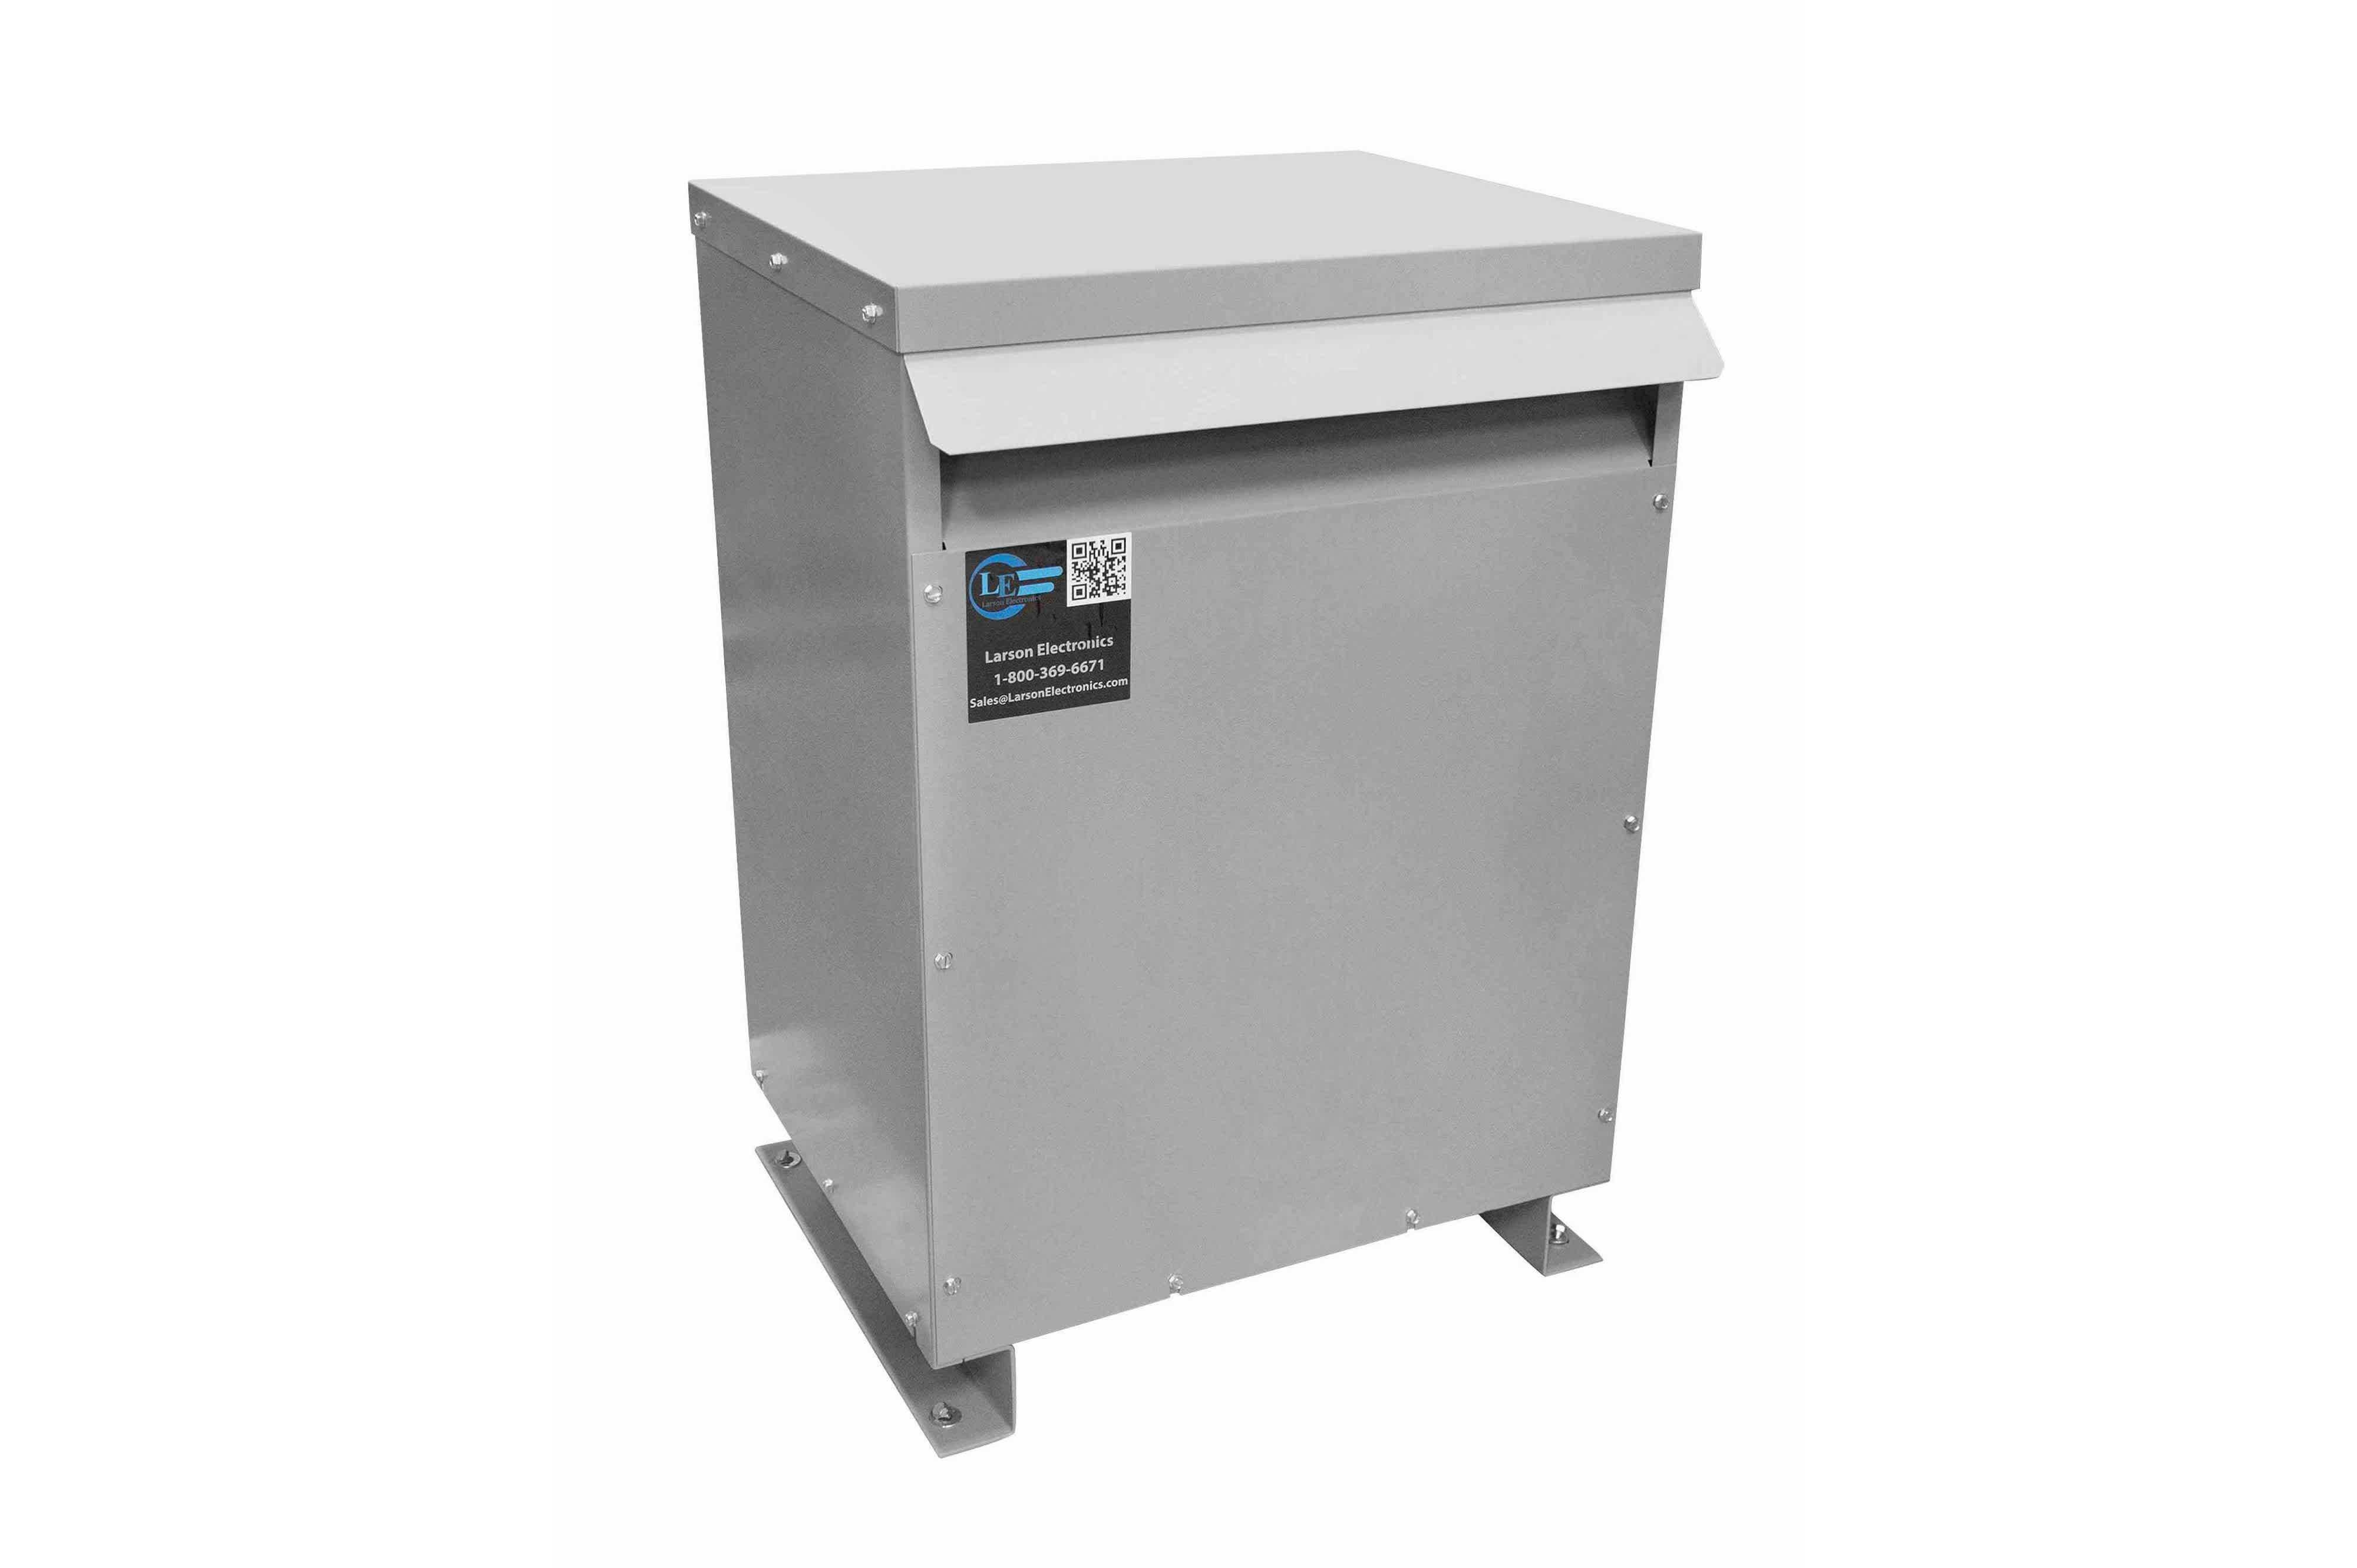 80 kVA 3PH DOE Transformer, 440V Delta Primary, 208Y/120 Wye-N Secondary, N3R, Ventilated, 60 Hz